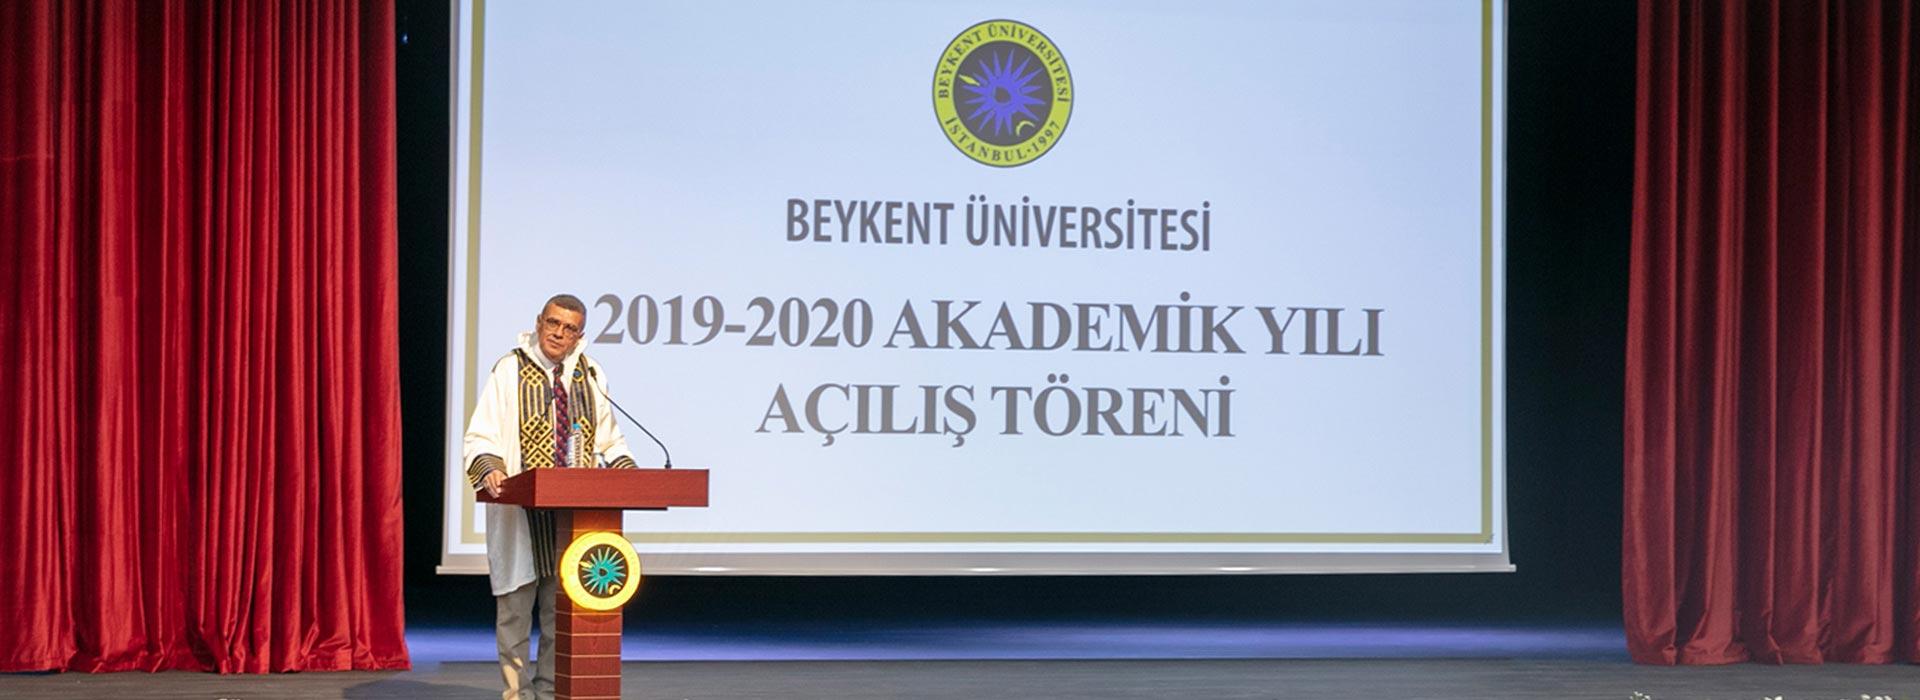 2019-2020-akademik-yil-acilis-toreni-1920x700